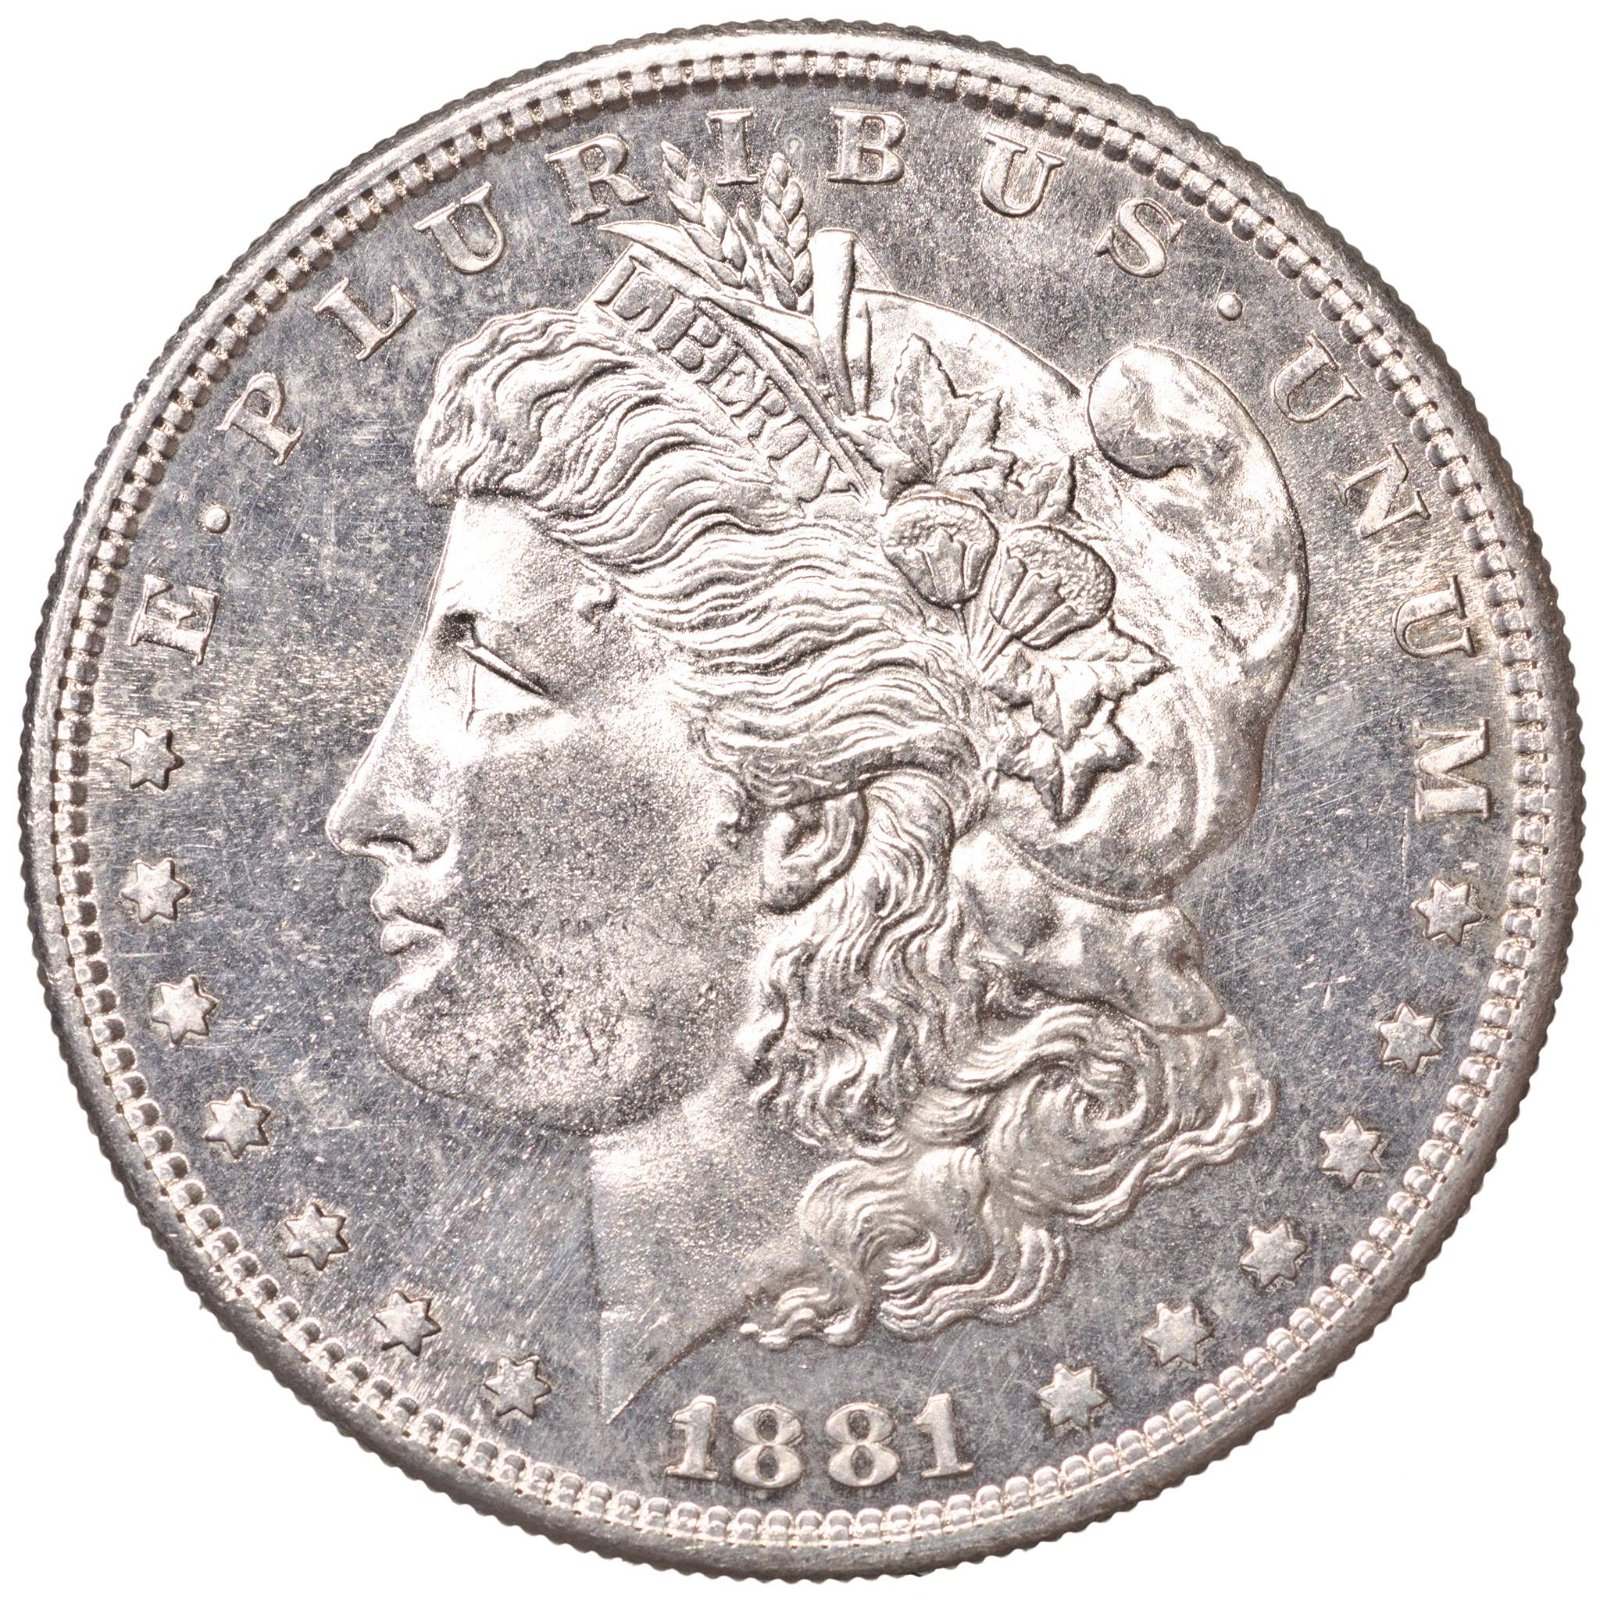 1881-S Morgan Silver Dollar, Brilliant, Prooflike